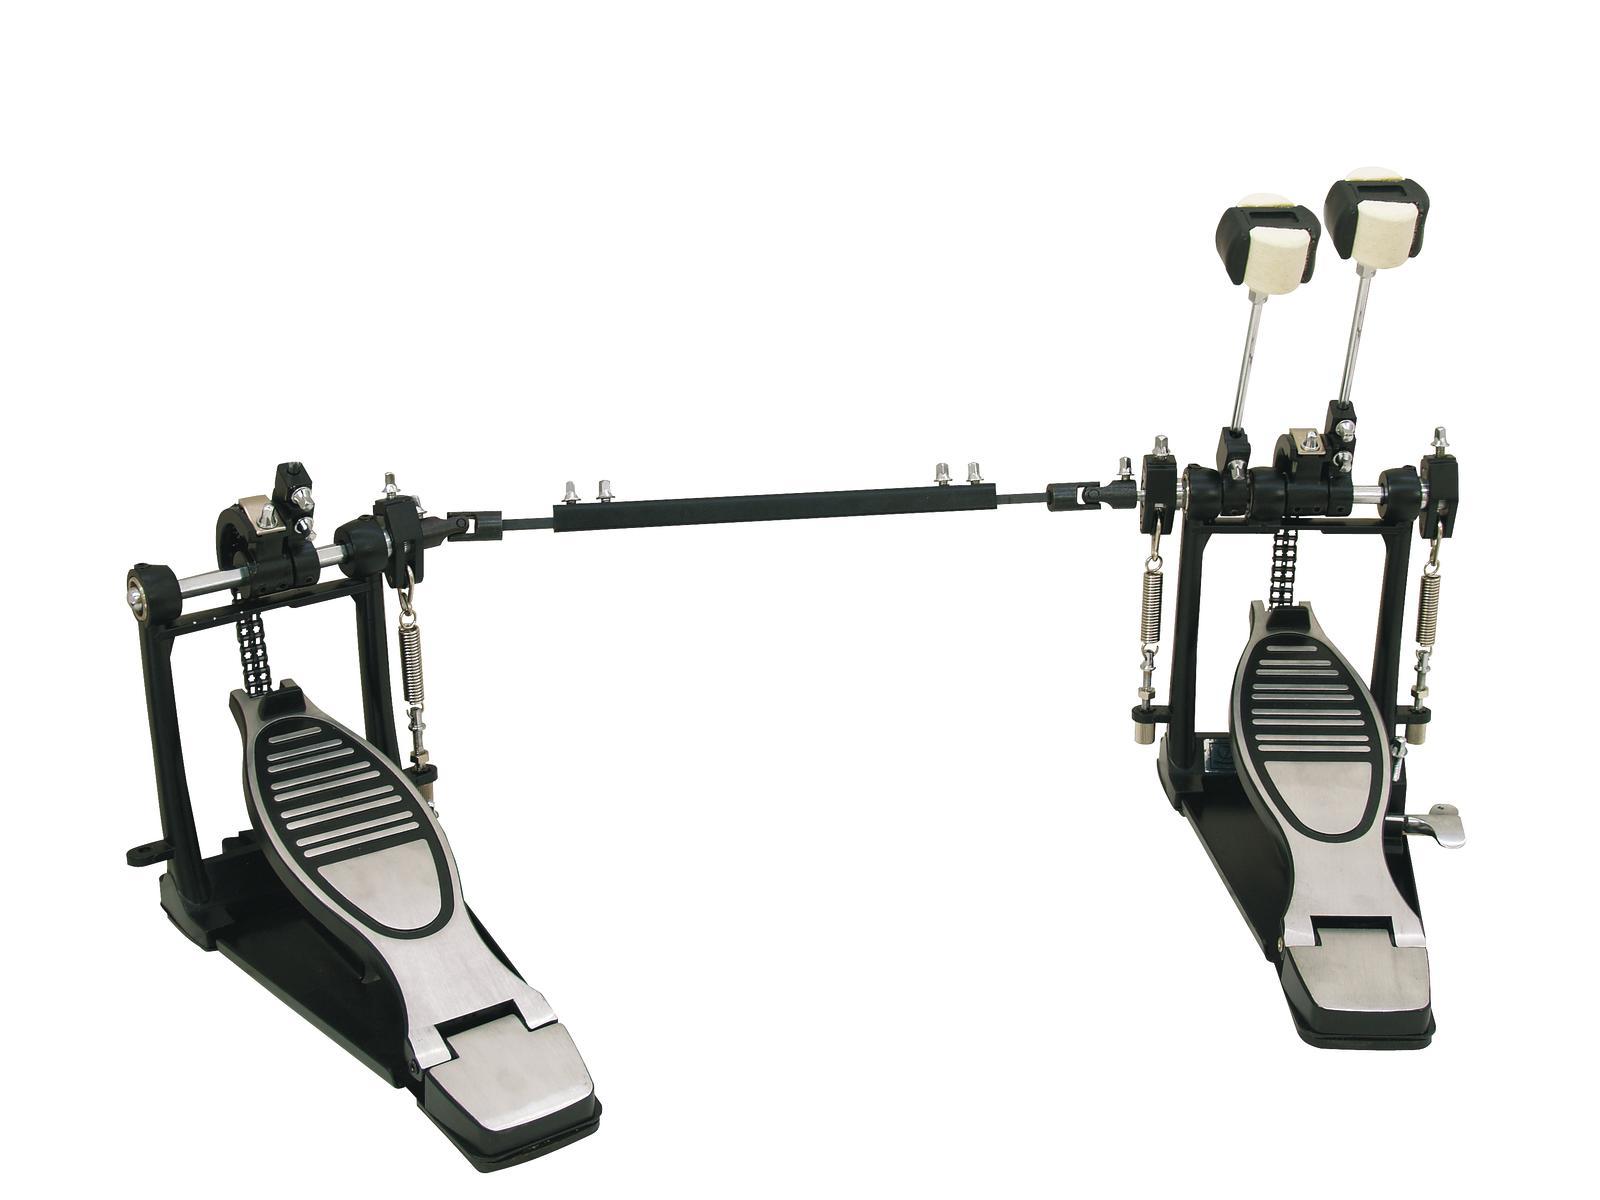 DIMAVERY DFM-1000 Doppel-Fußmaschine